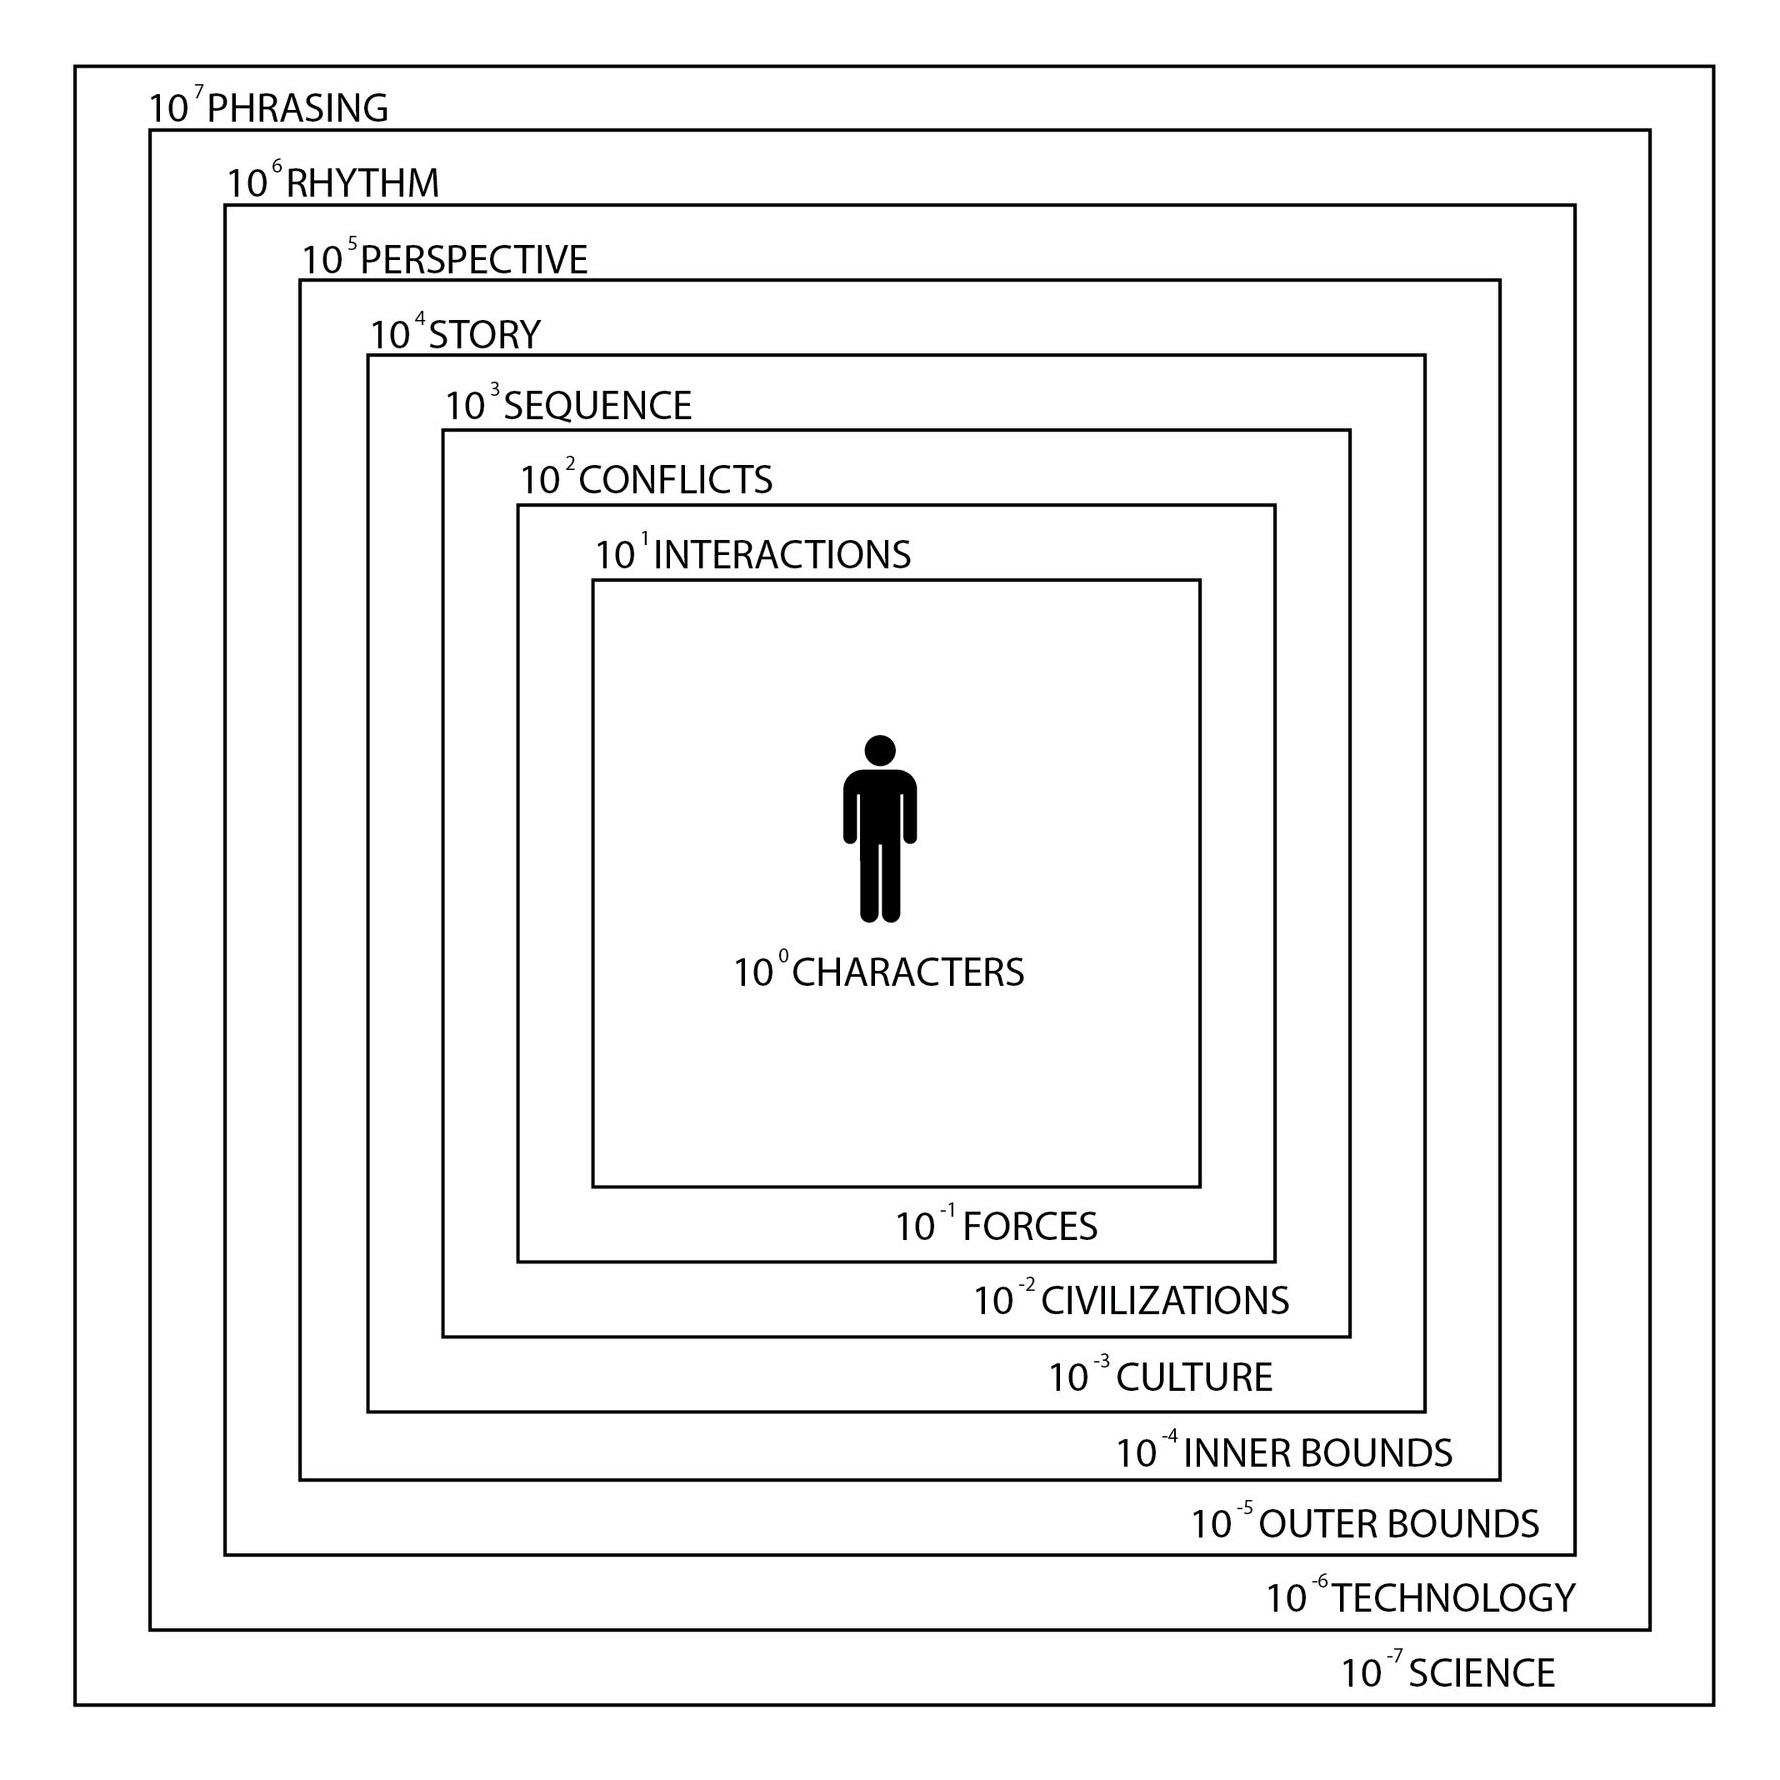 POWERS OF TEN DIAGRAM & NARRATIVE CONSIDERATIONS